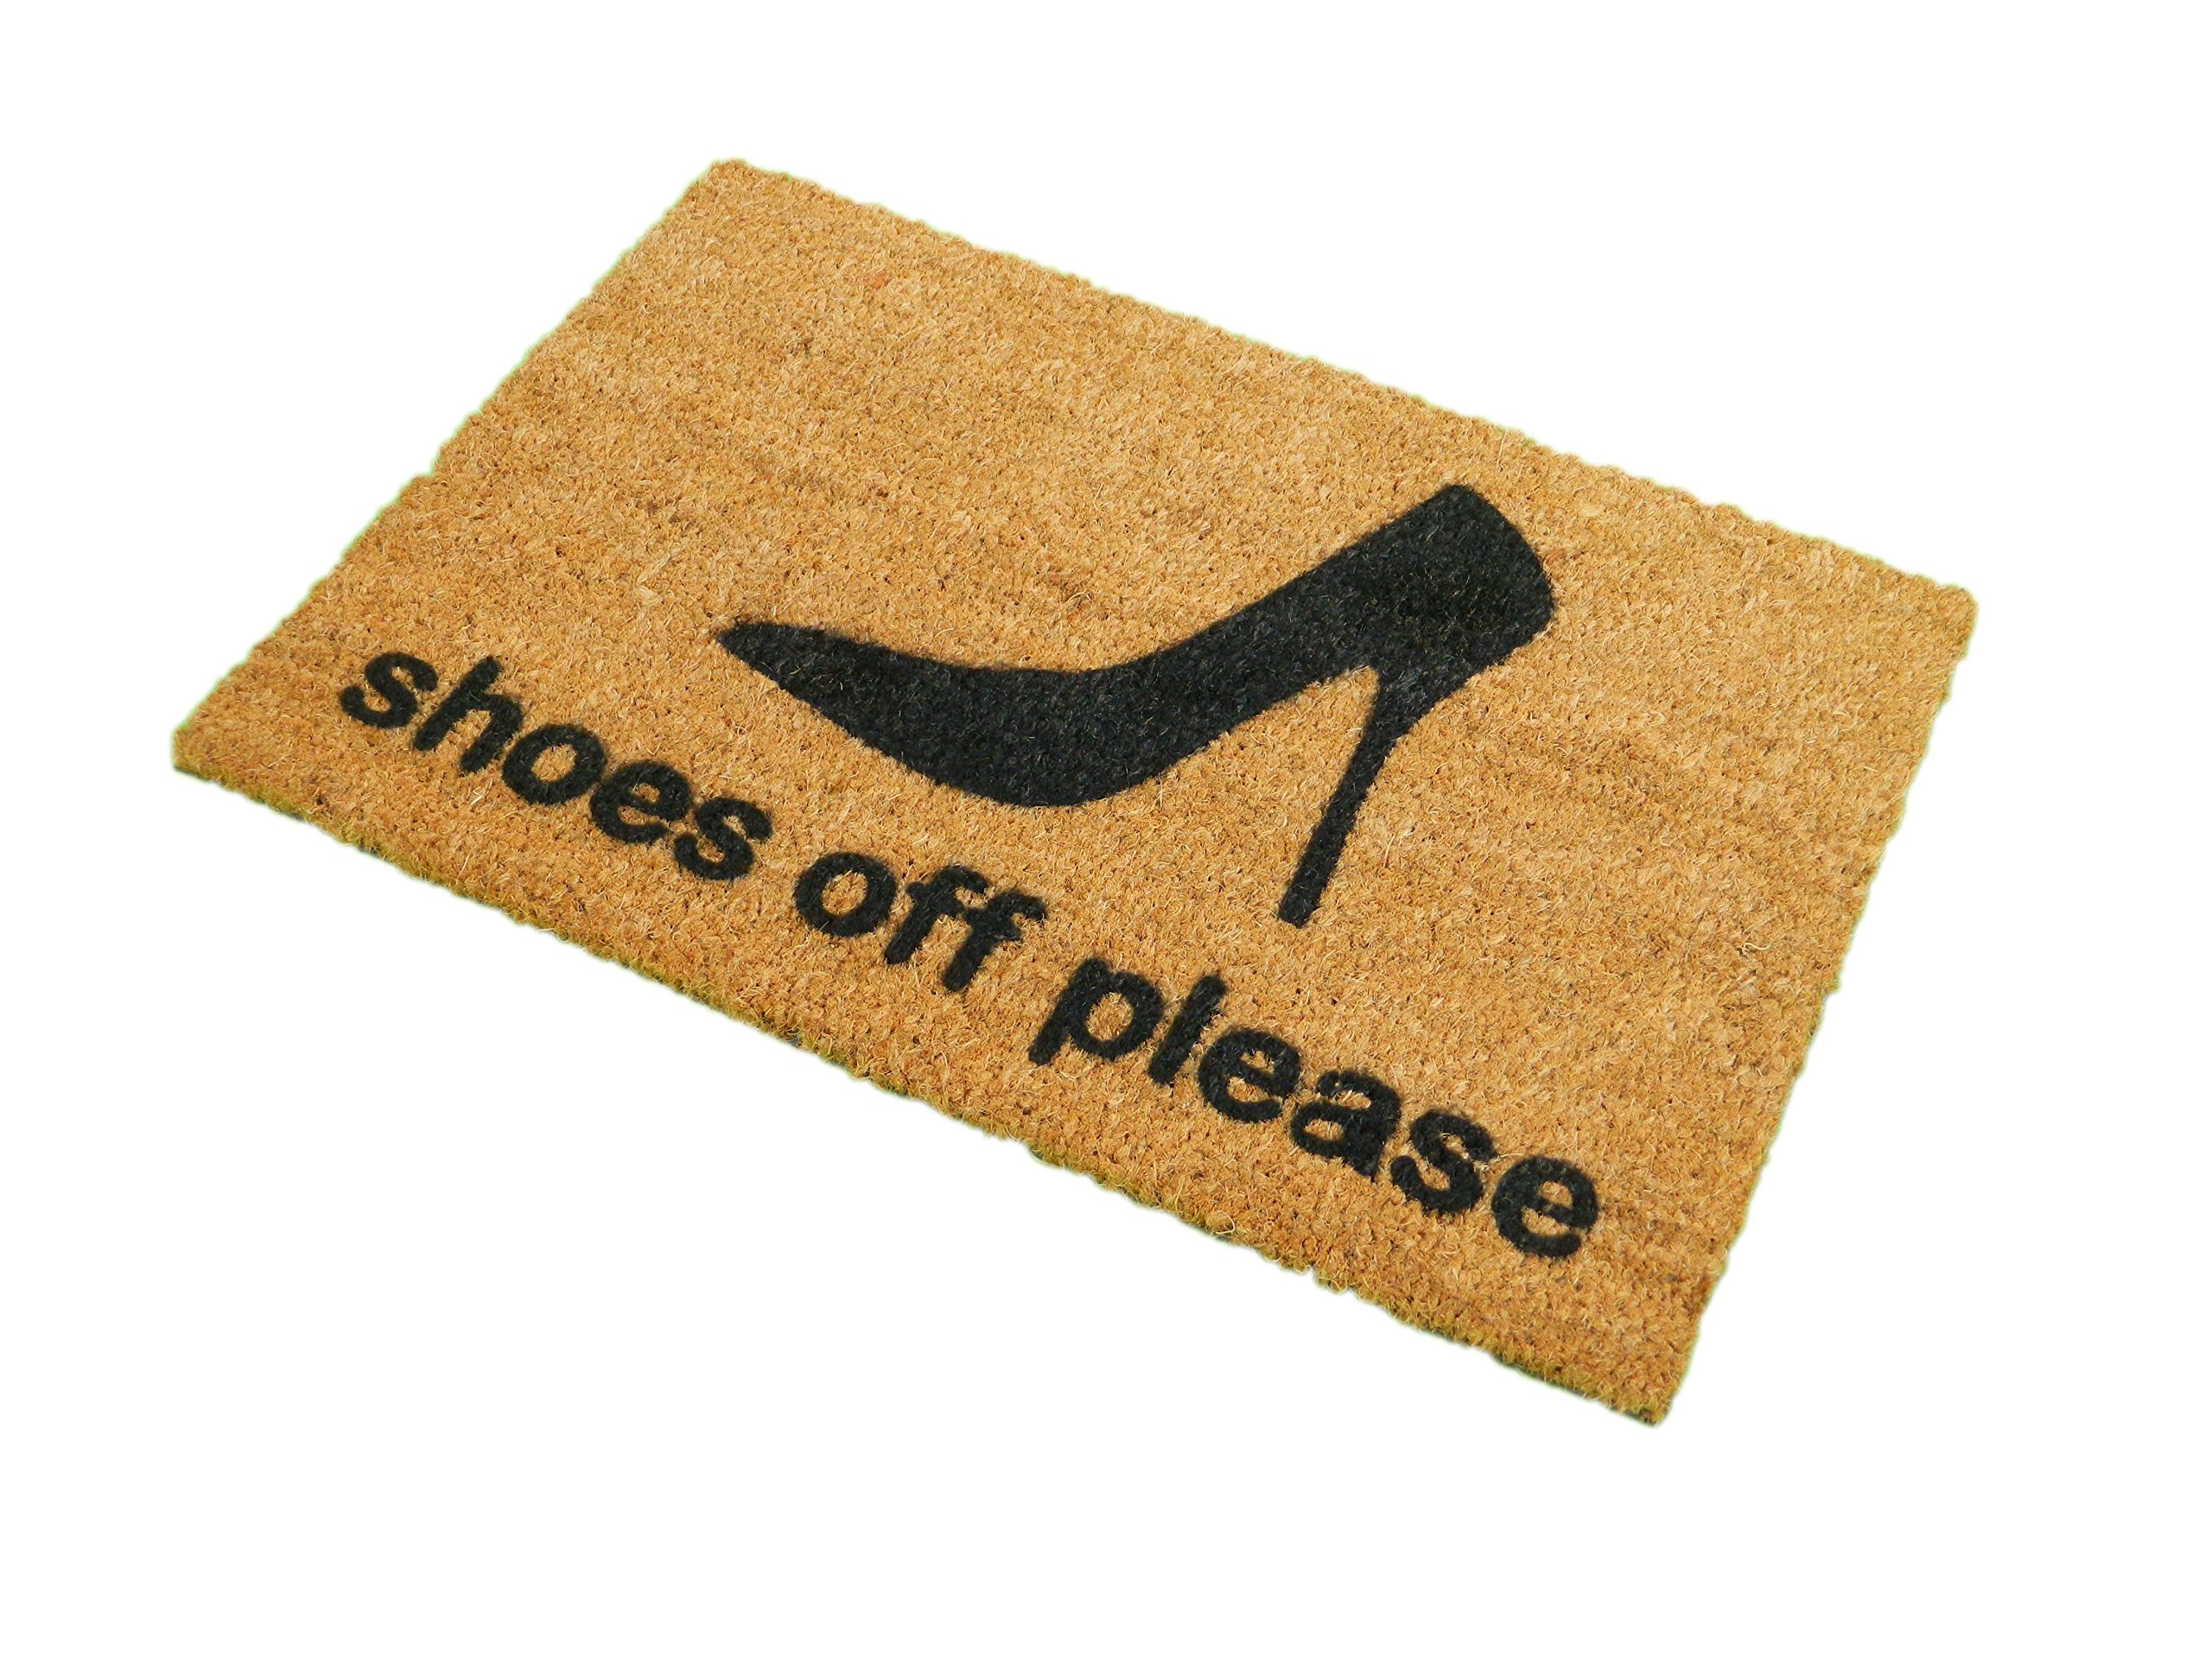 CKB Ltd Shoes Off Please Novelty Doormat Unique Doormats Front/Back Funny Door Mats Made With A Non-Slip Pvc Backing - Natural Coir - Indoor & Outdoor by CKB Ltd